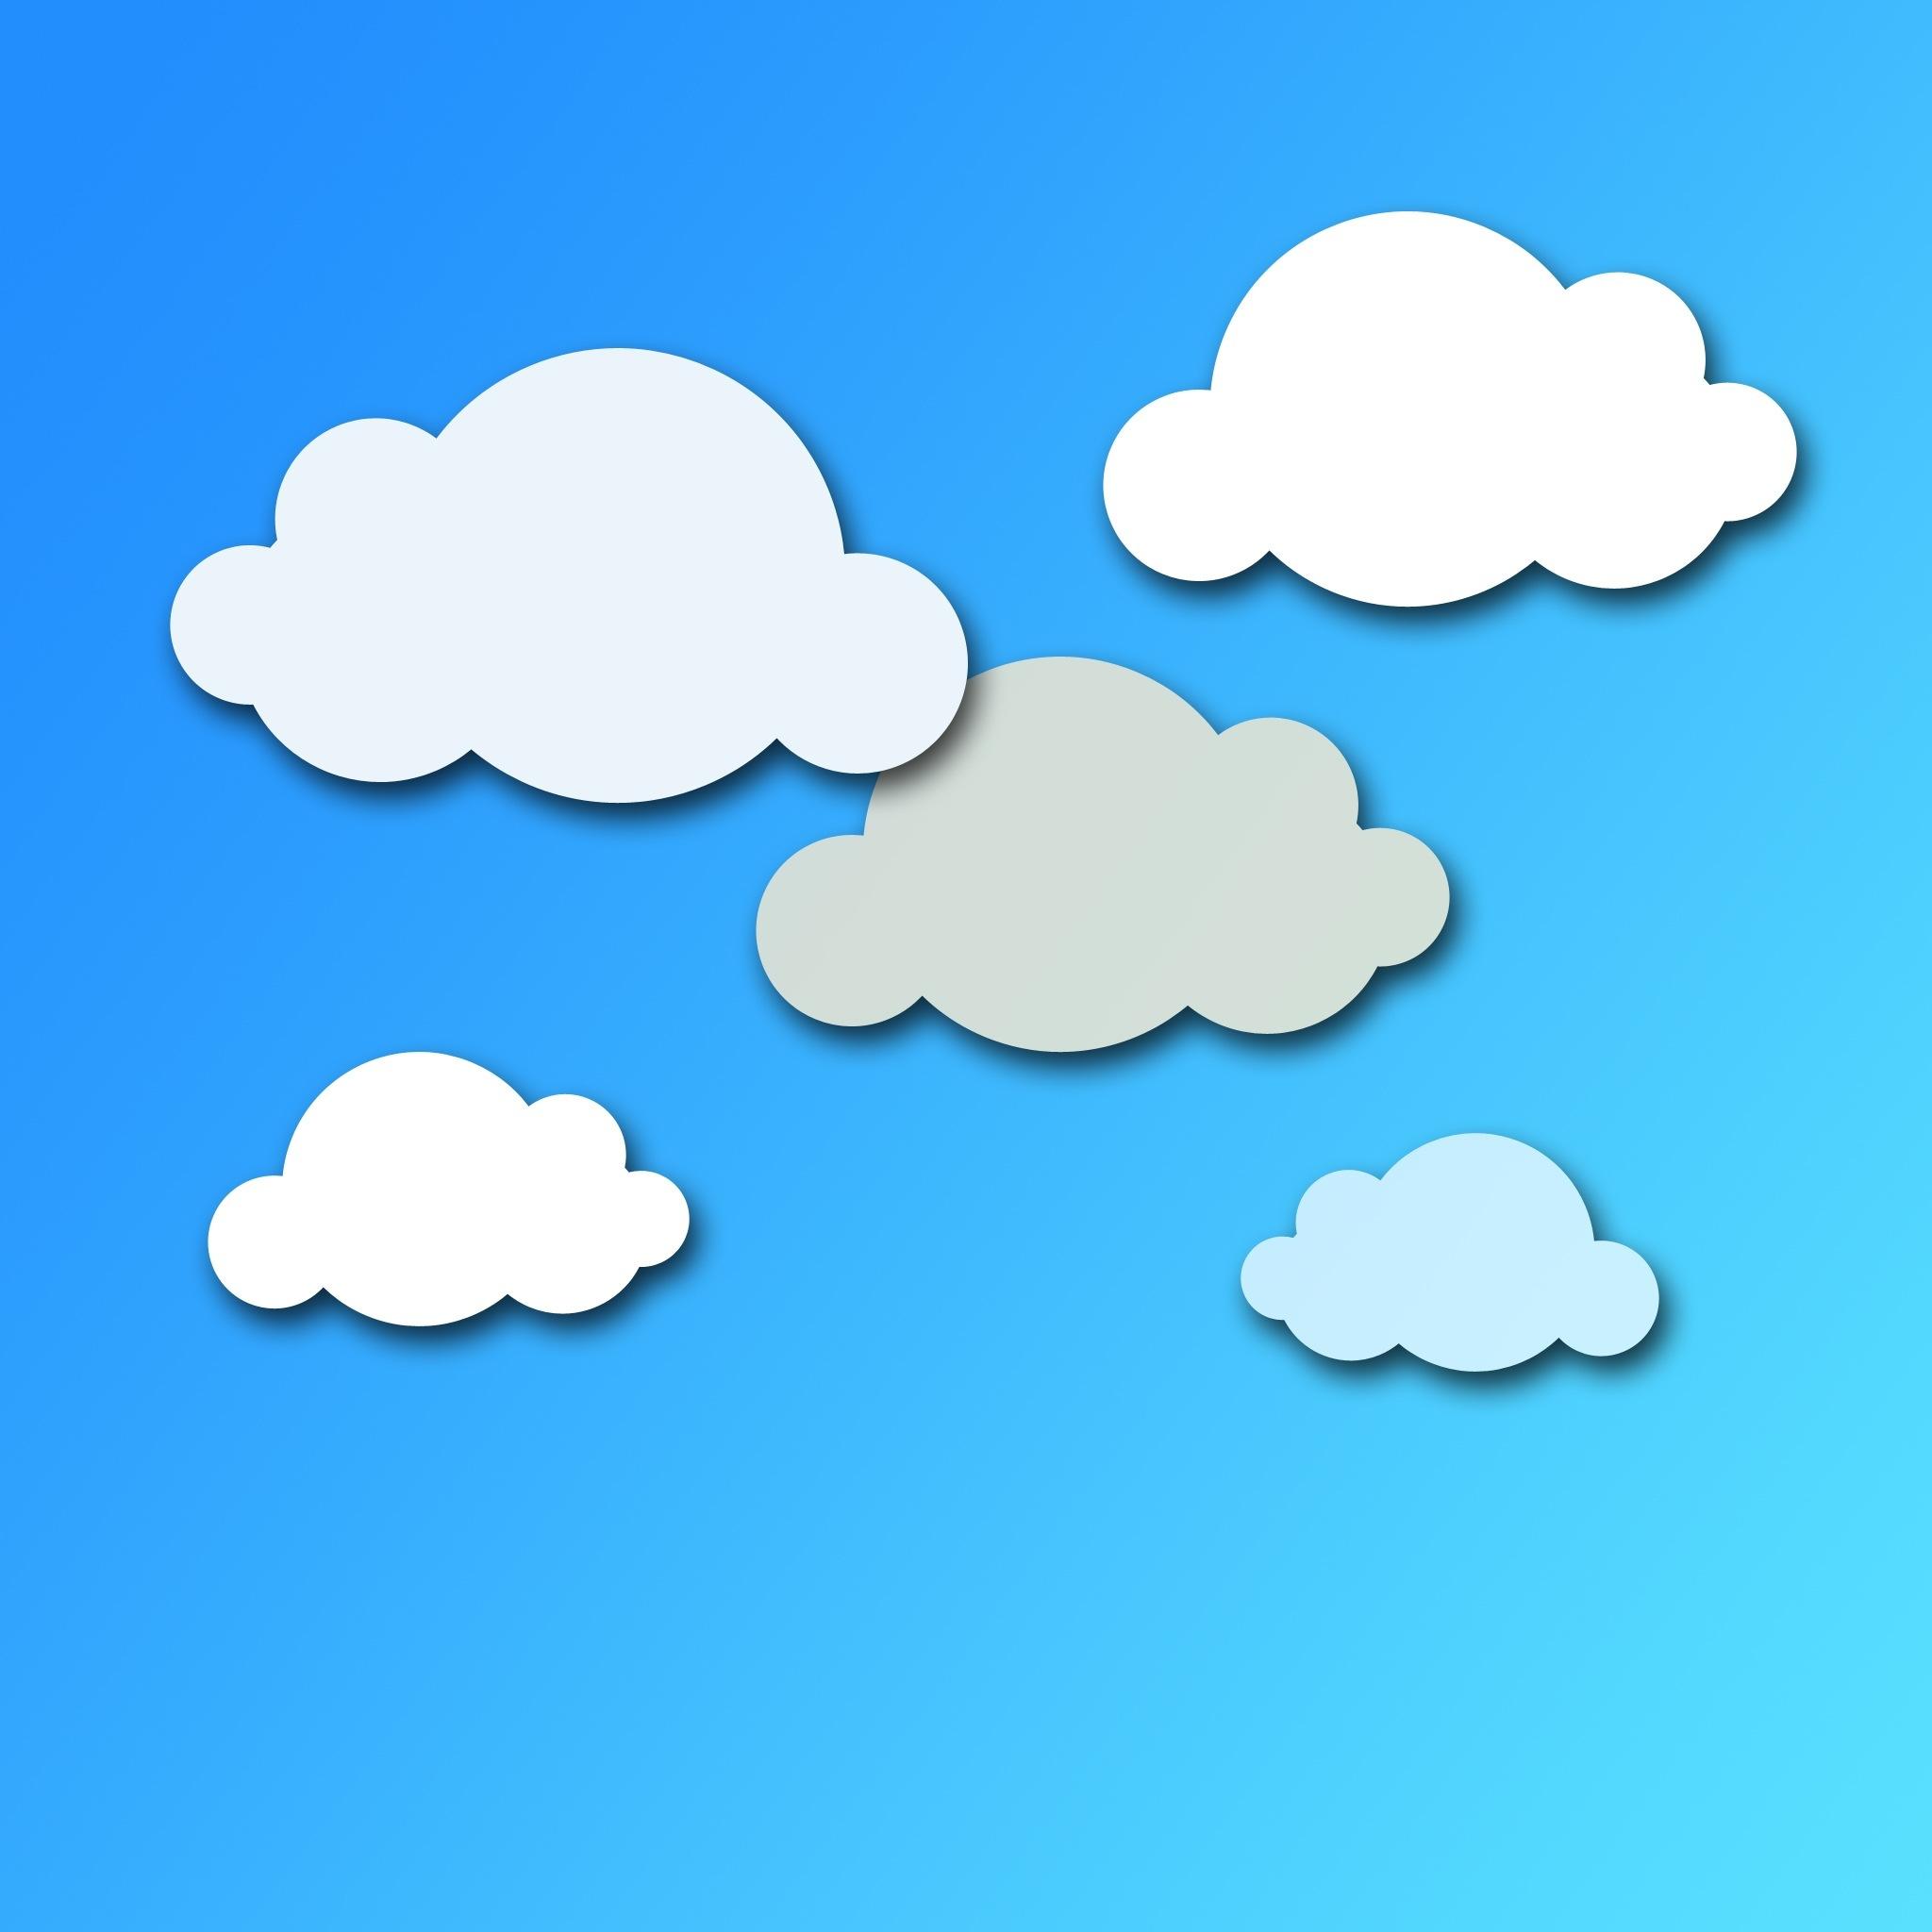 Fondos de nubes para fotos infantiles imagui - Imagenes de nubes infantiles ...